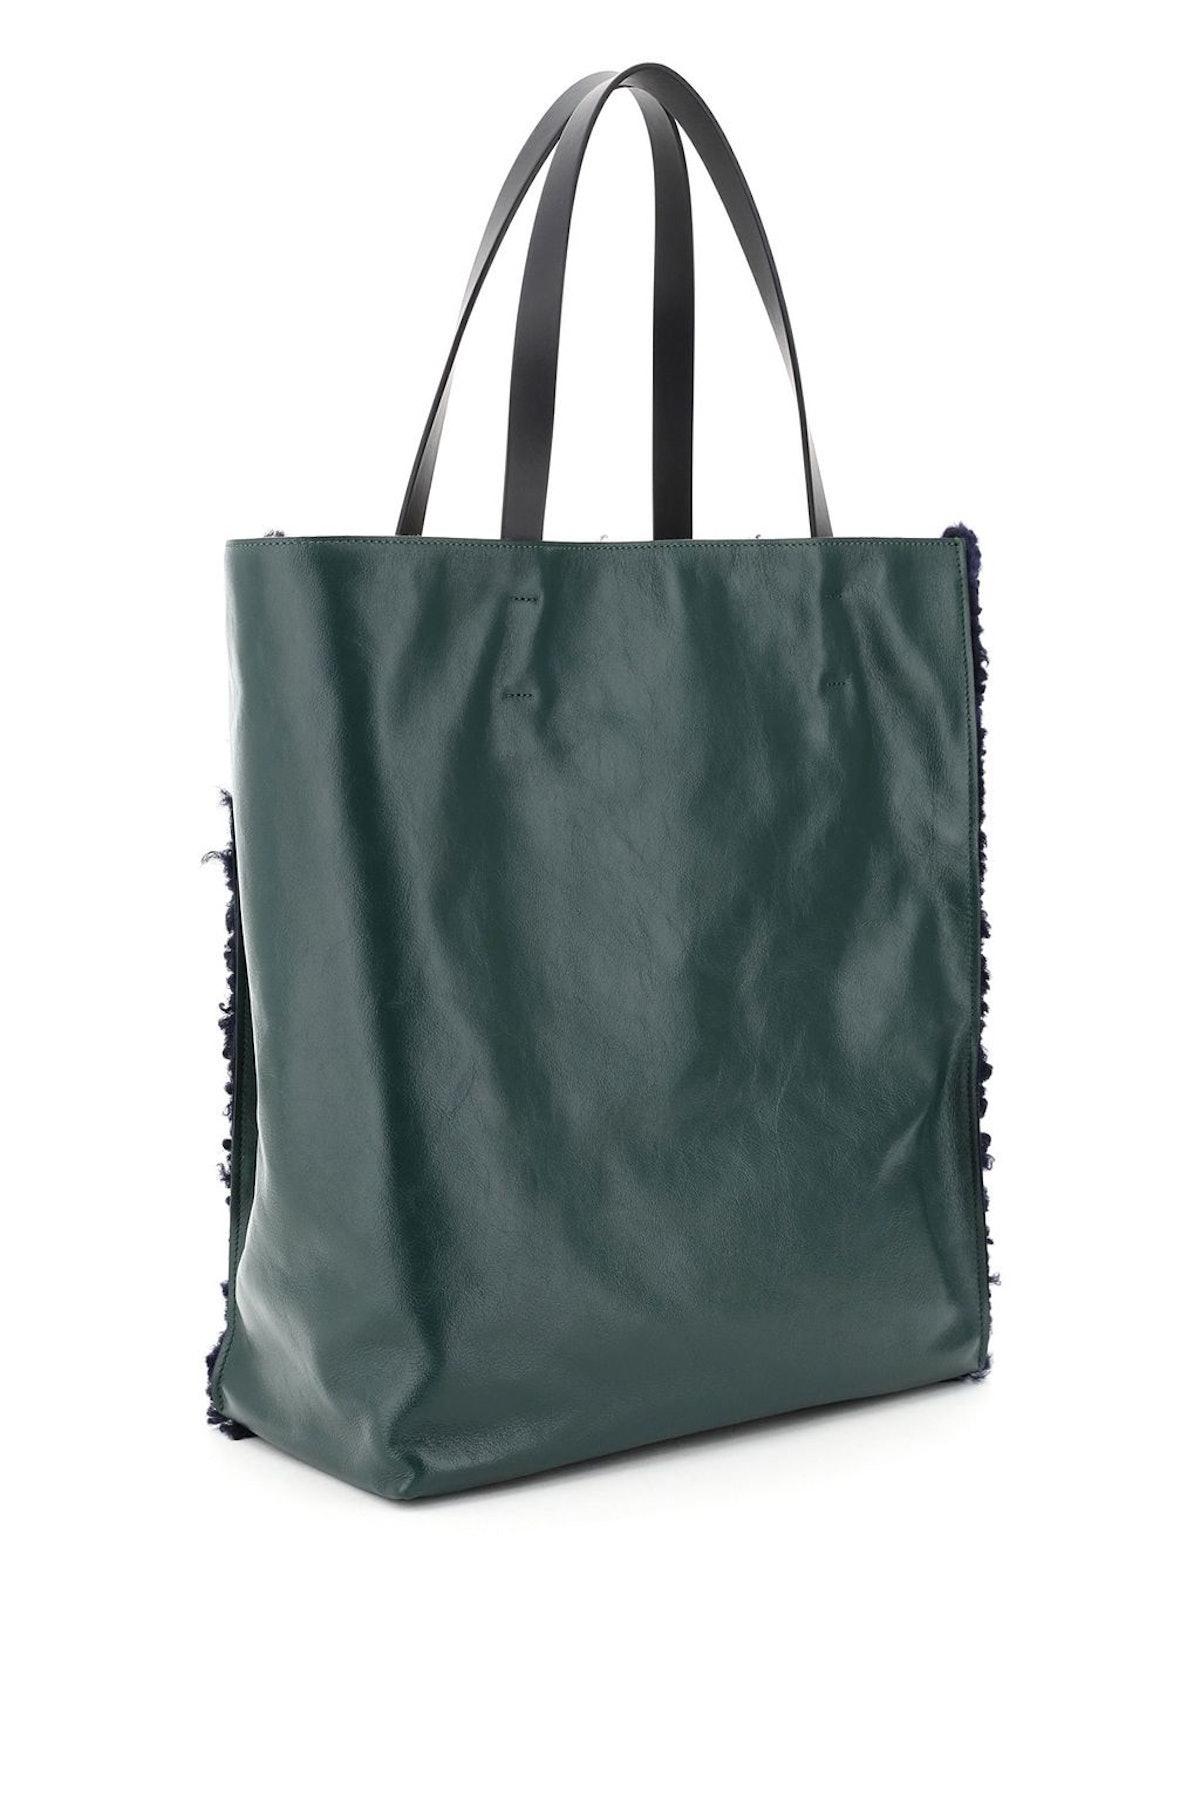 Marni Museo Large Tote Bag: image 1